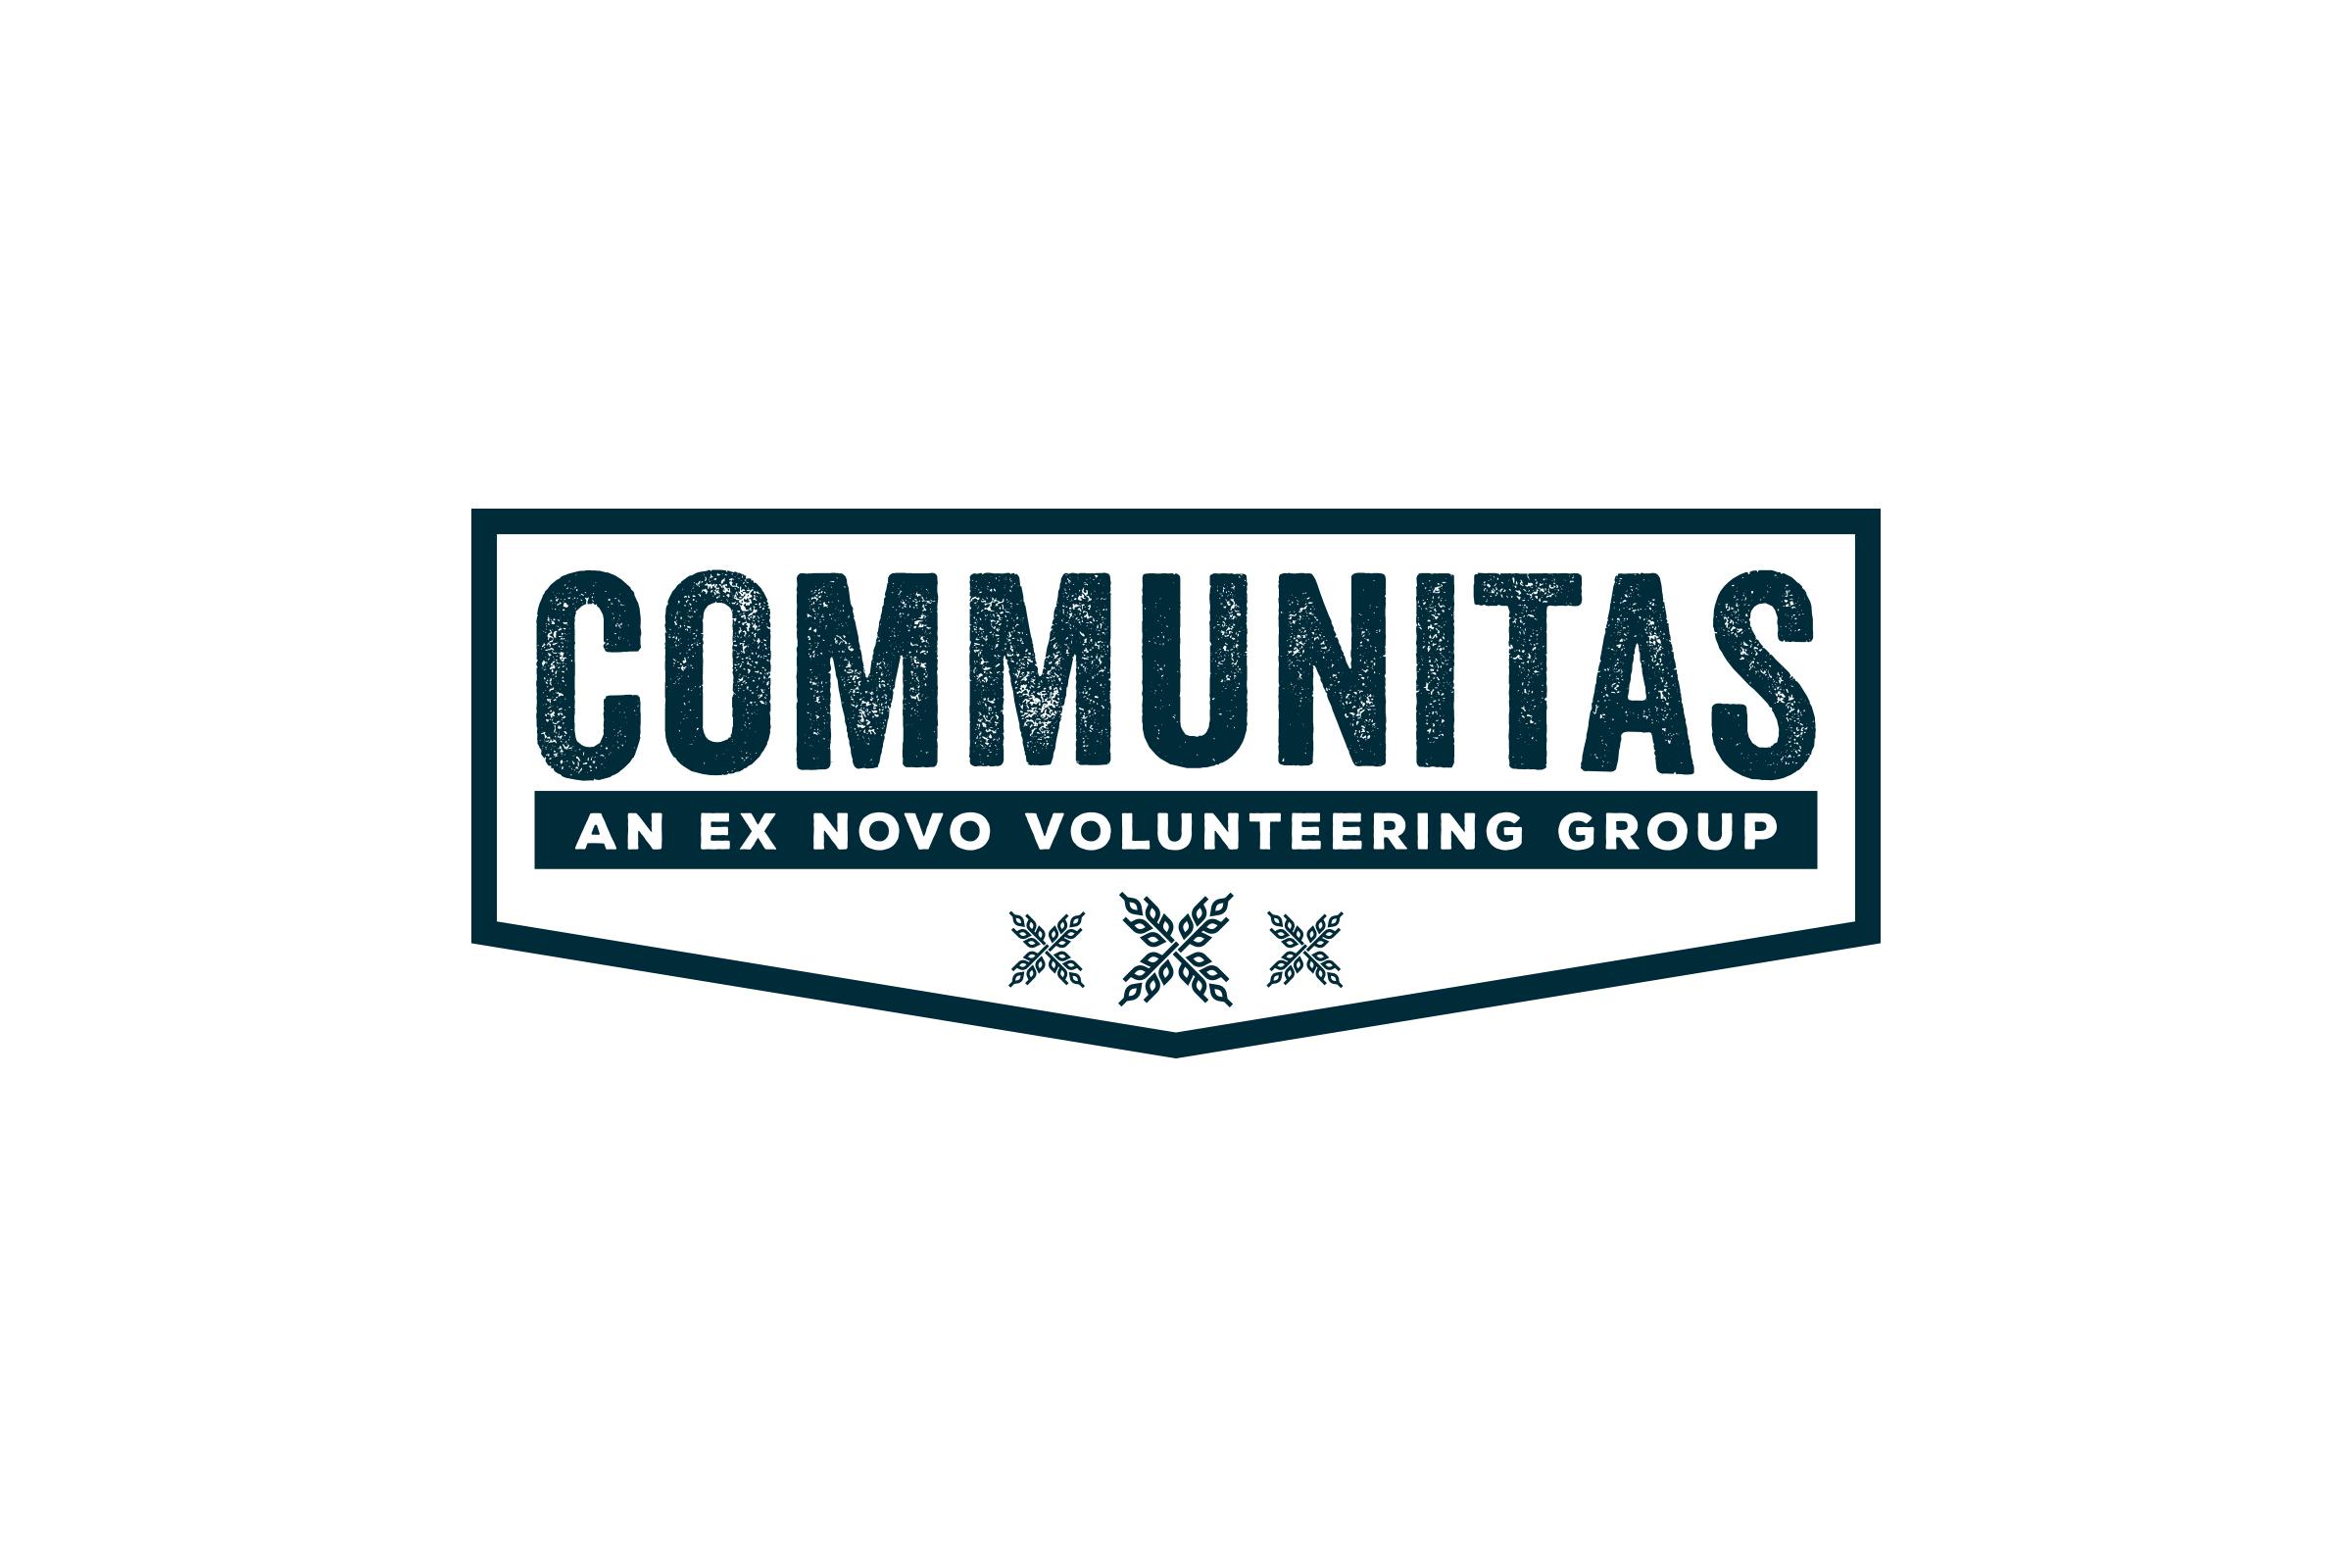 CommunitasHeader.jpg